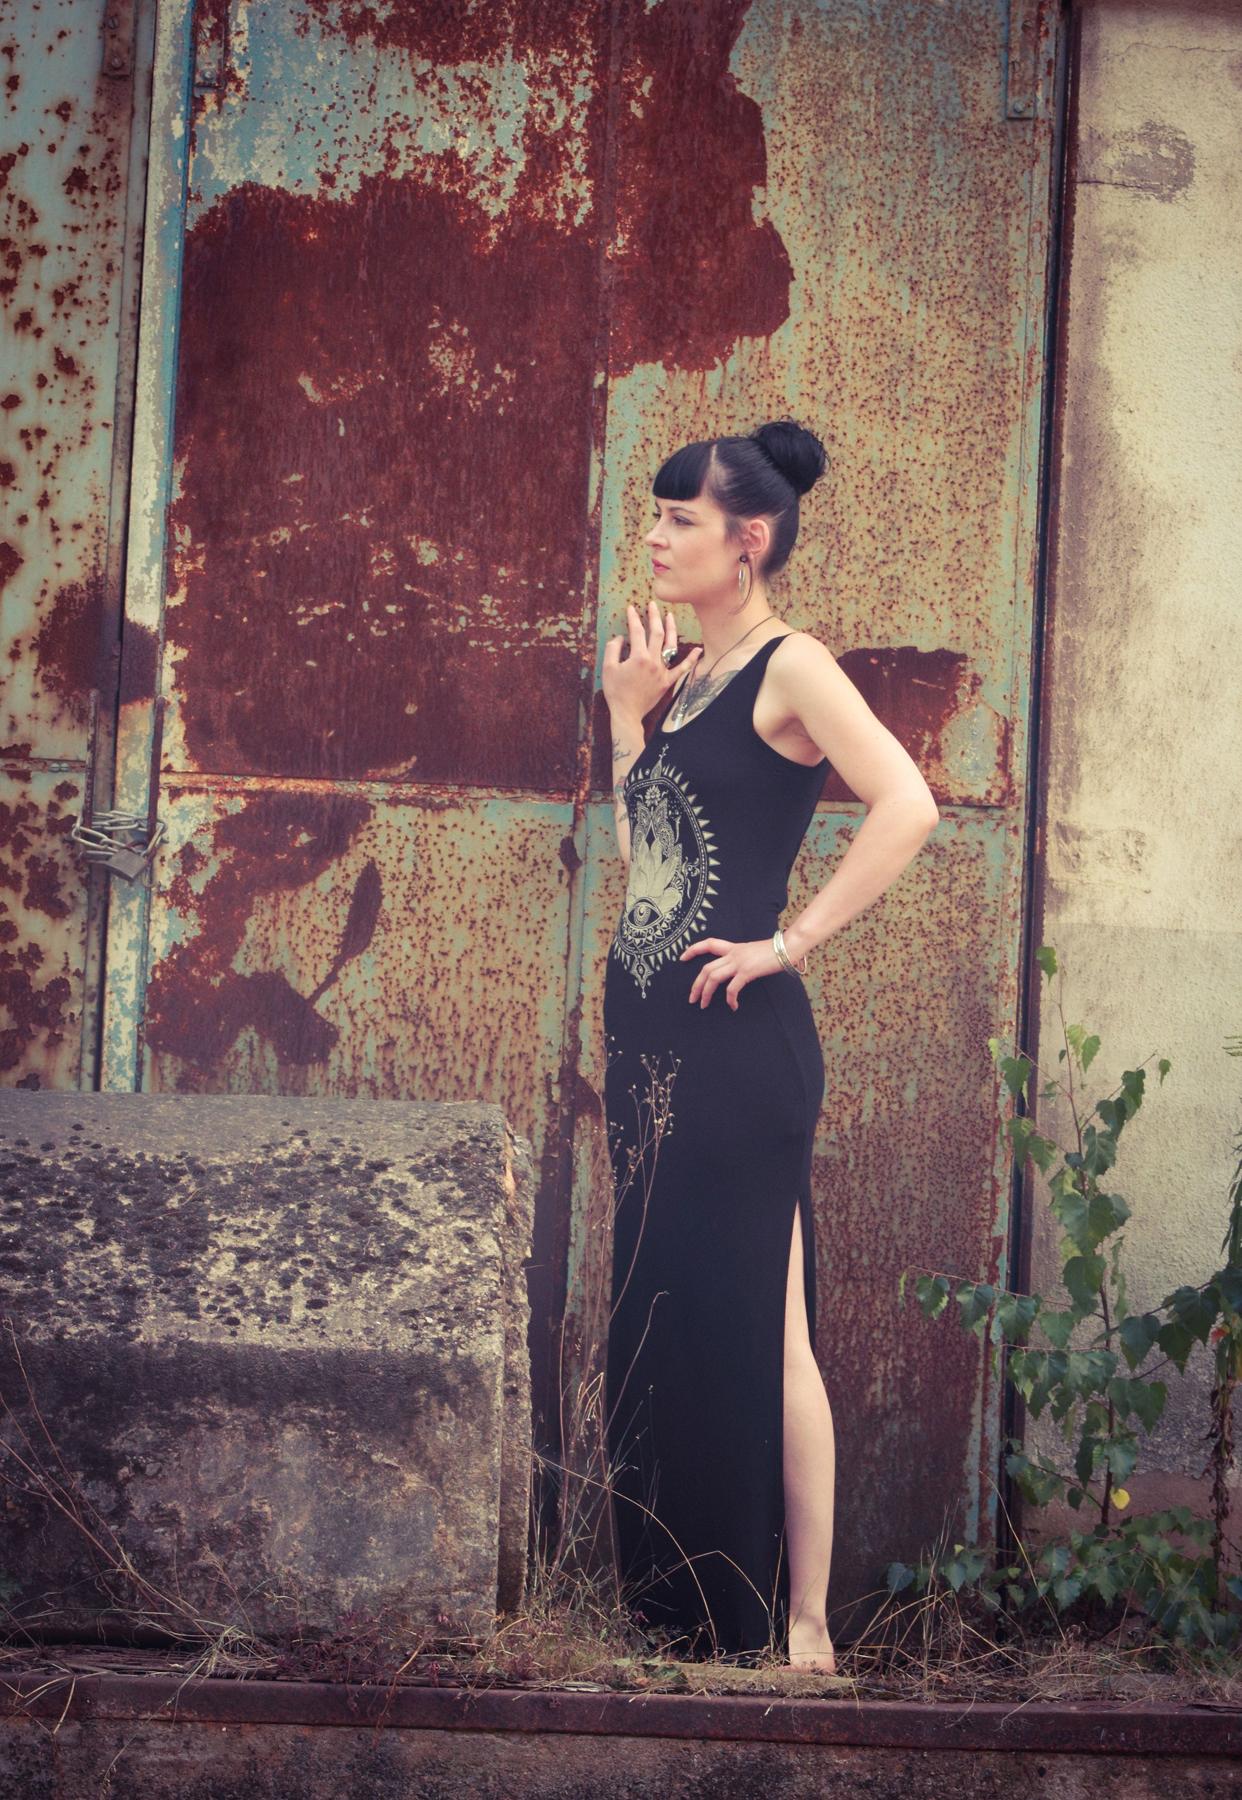 DEMON INCARNATE - Interviews (Lisa-2)